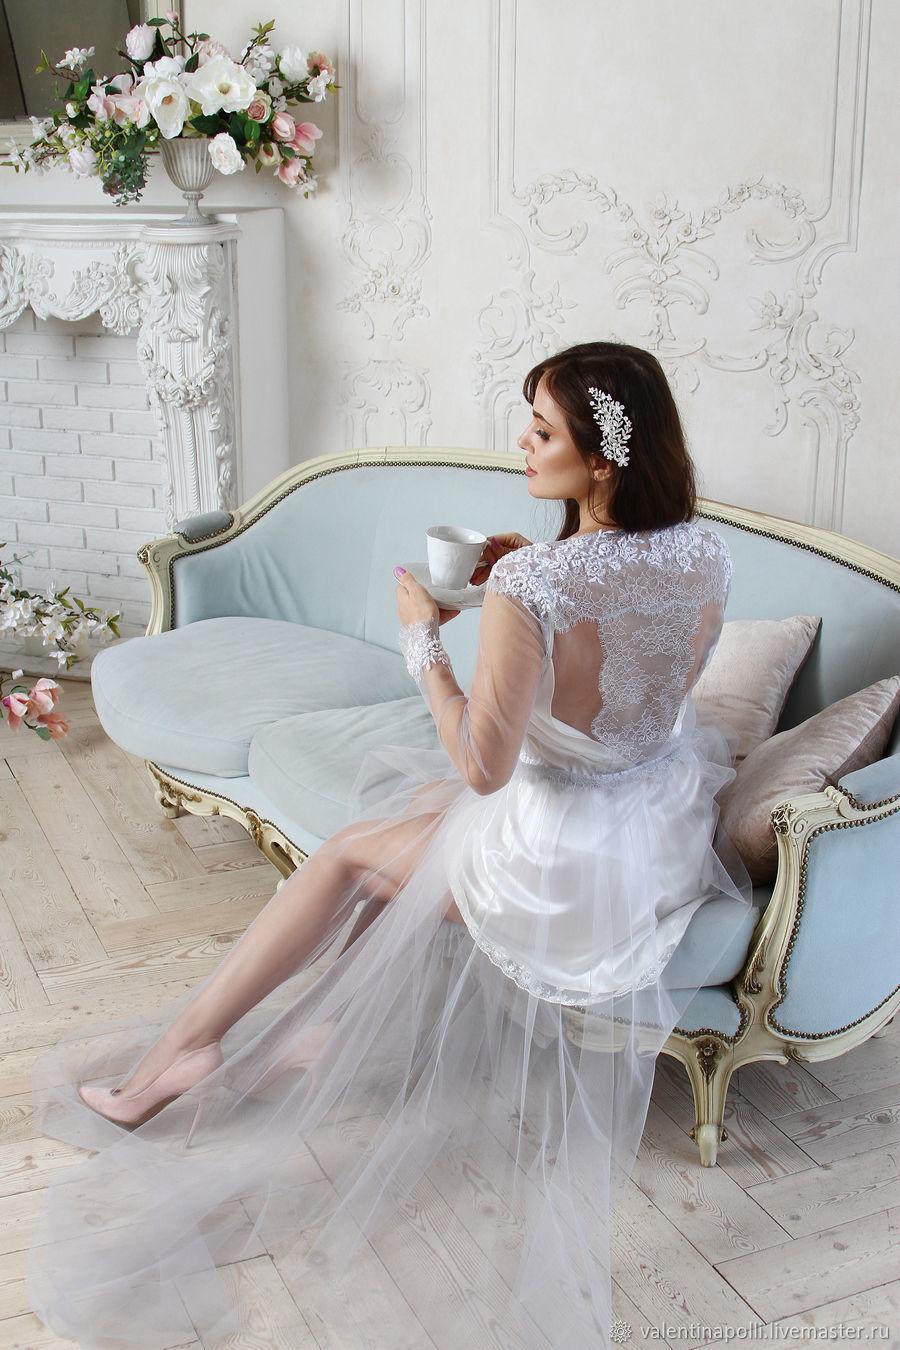 "Boudoir dress "" Marengo"", Wedding dresses, Moscow,  Фото №1"